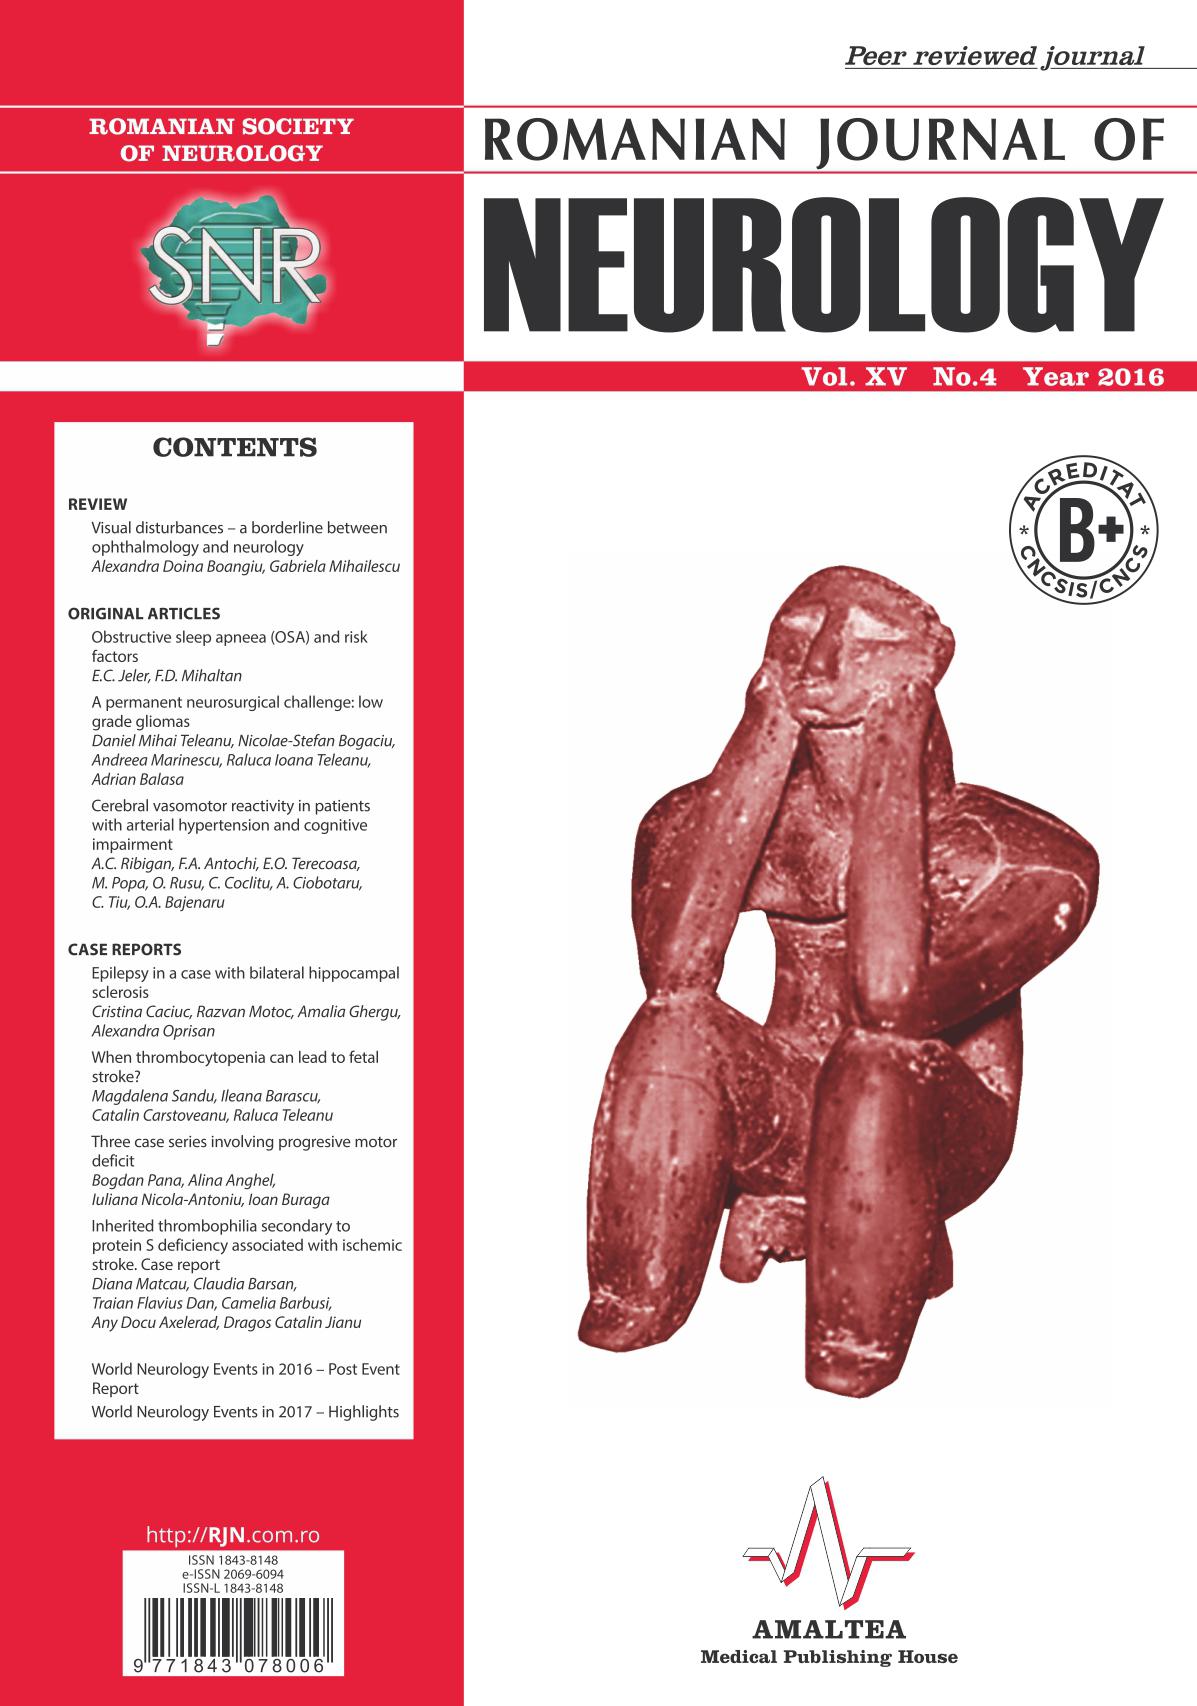 Romanian Journal of Neurology, Volume XV, No. 4, 2016